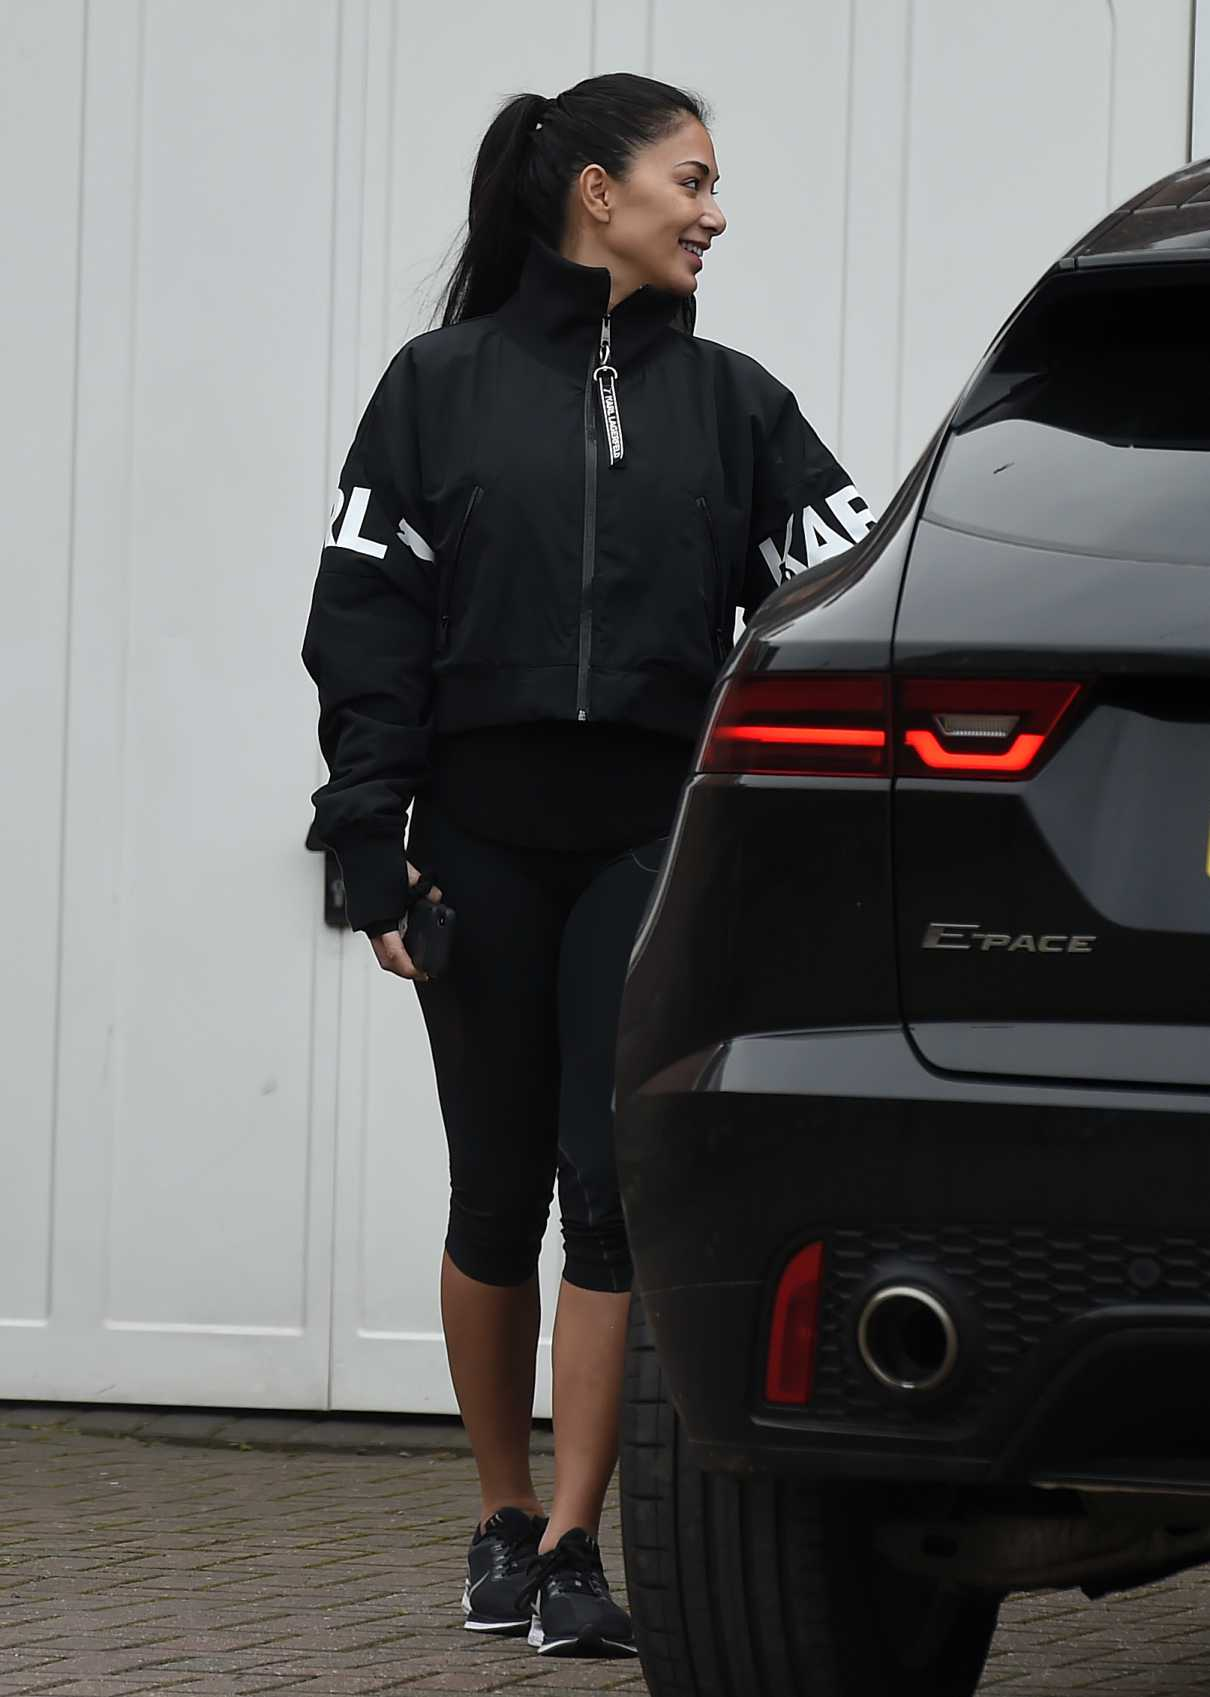 Nicole Scherzinger in a Black Sneakers